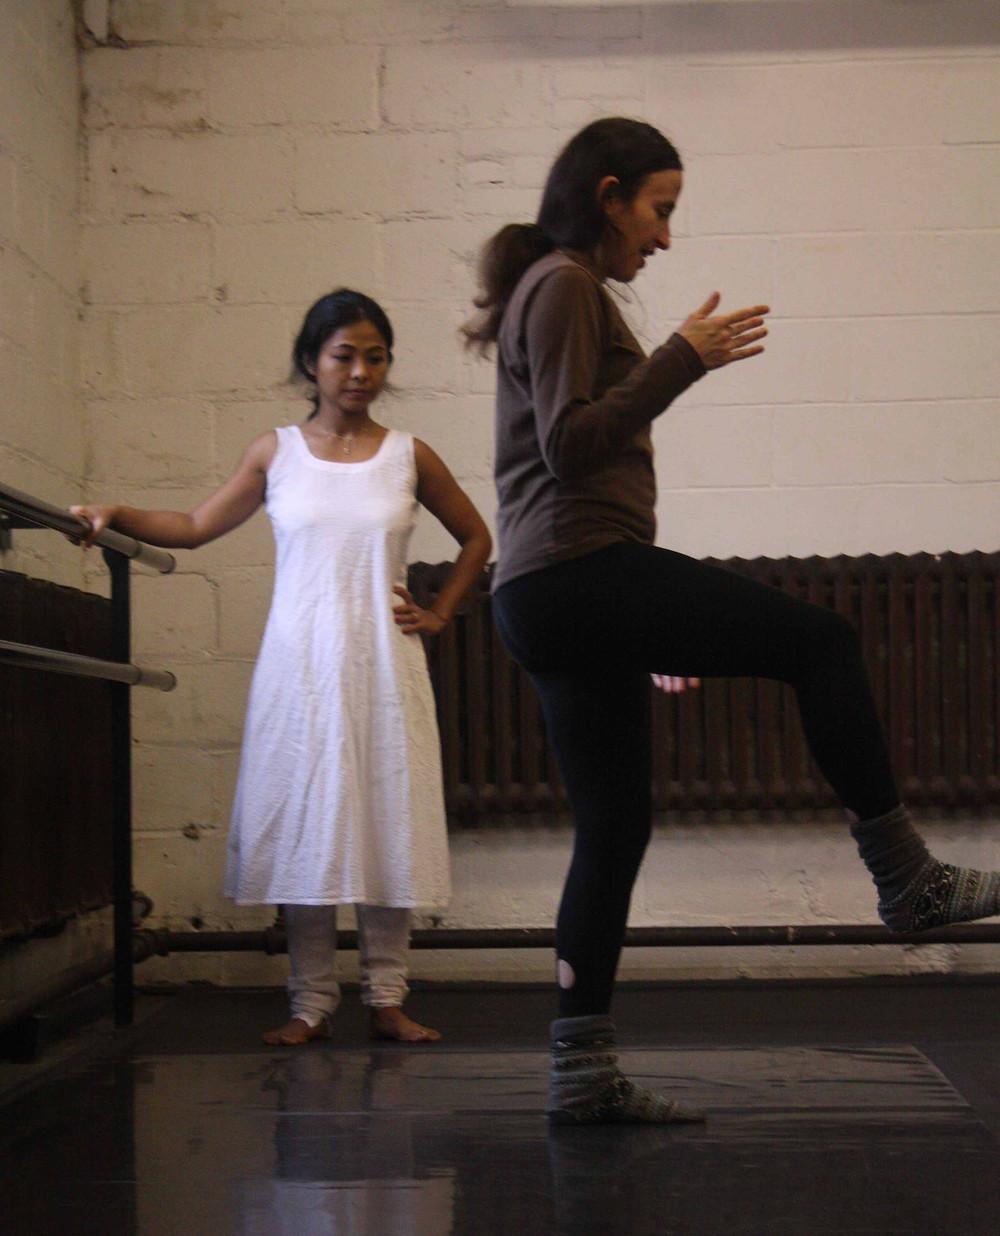 Nika Stein (choreographer) Fabiola Ugarte, Deepali Lindblom, Yui Ugai (interpreters) Montreal and Baie Comeau Quebec